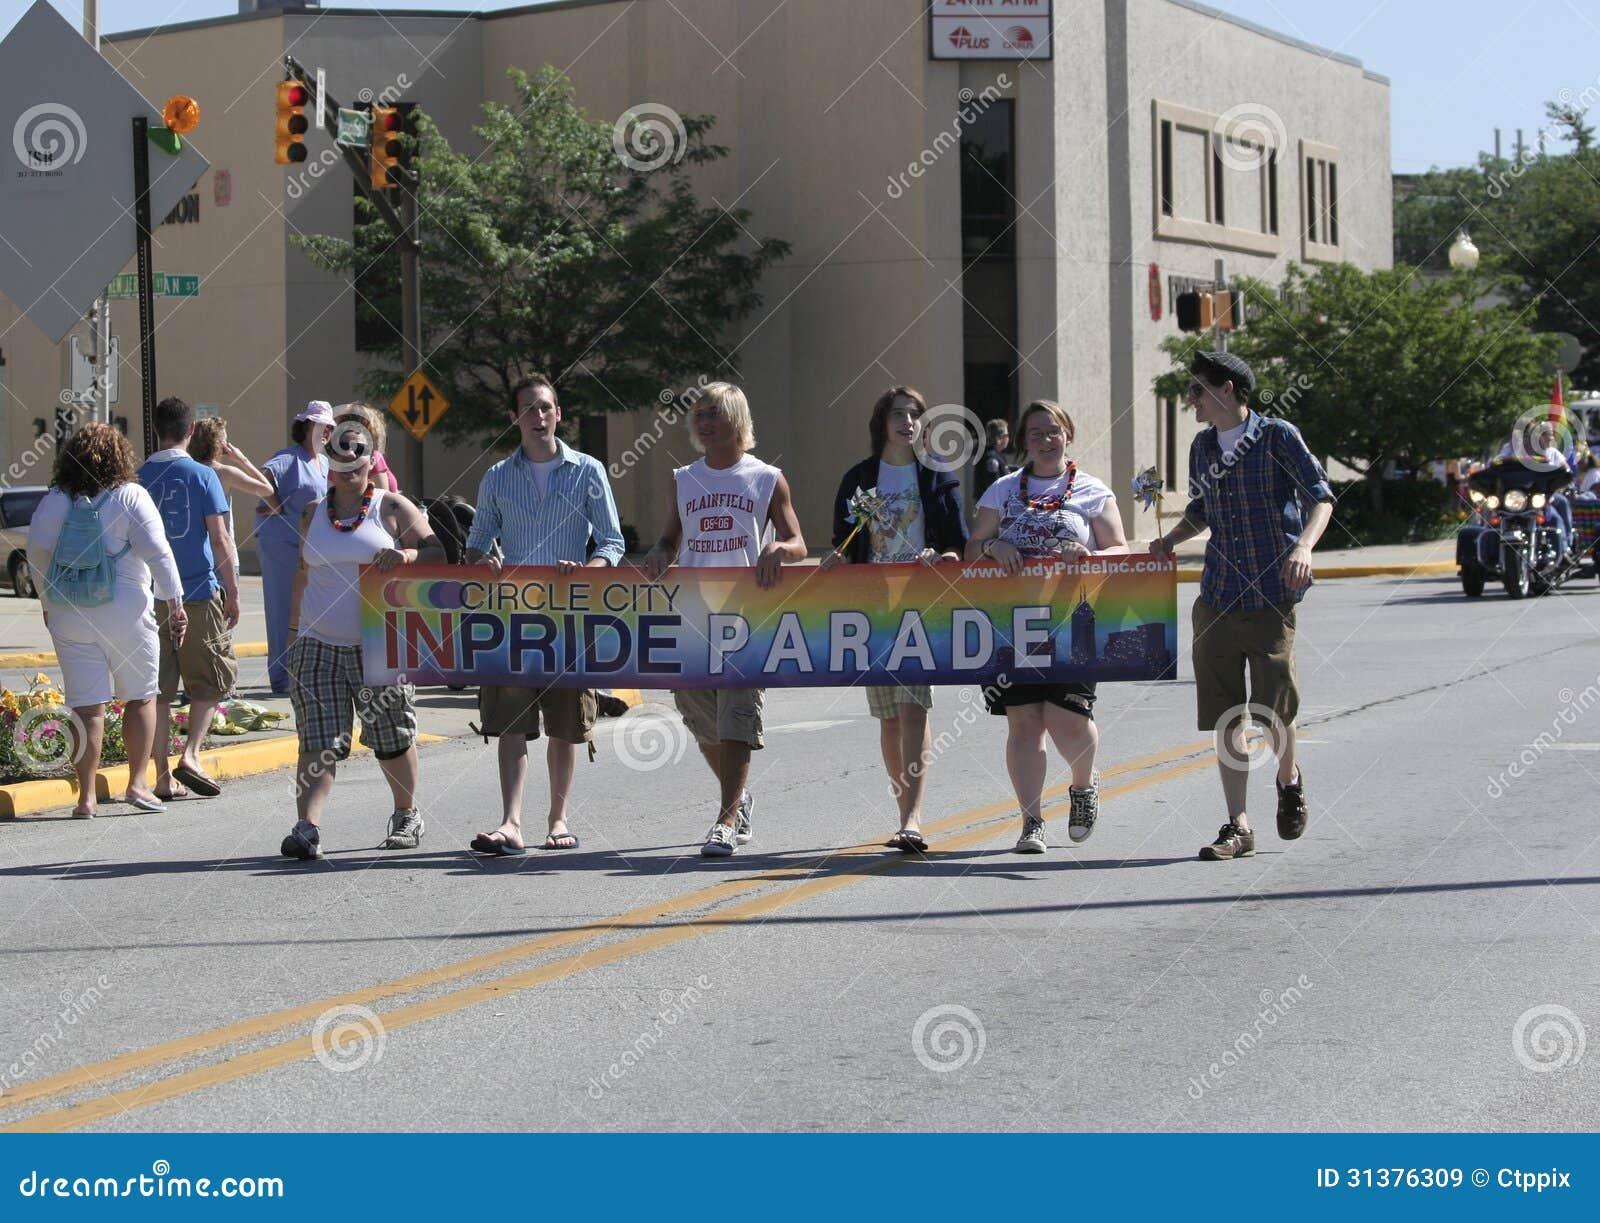 Circle City INPride Parade